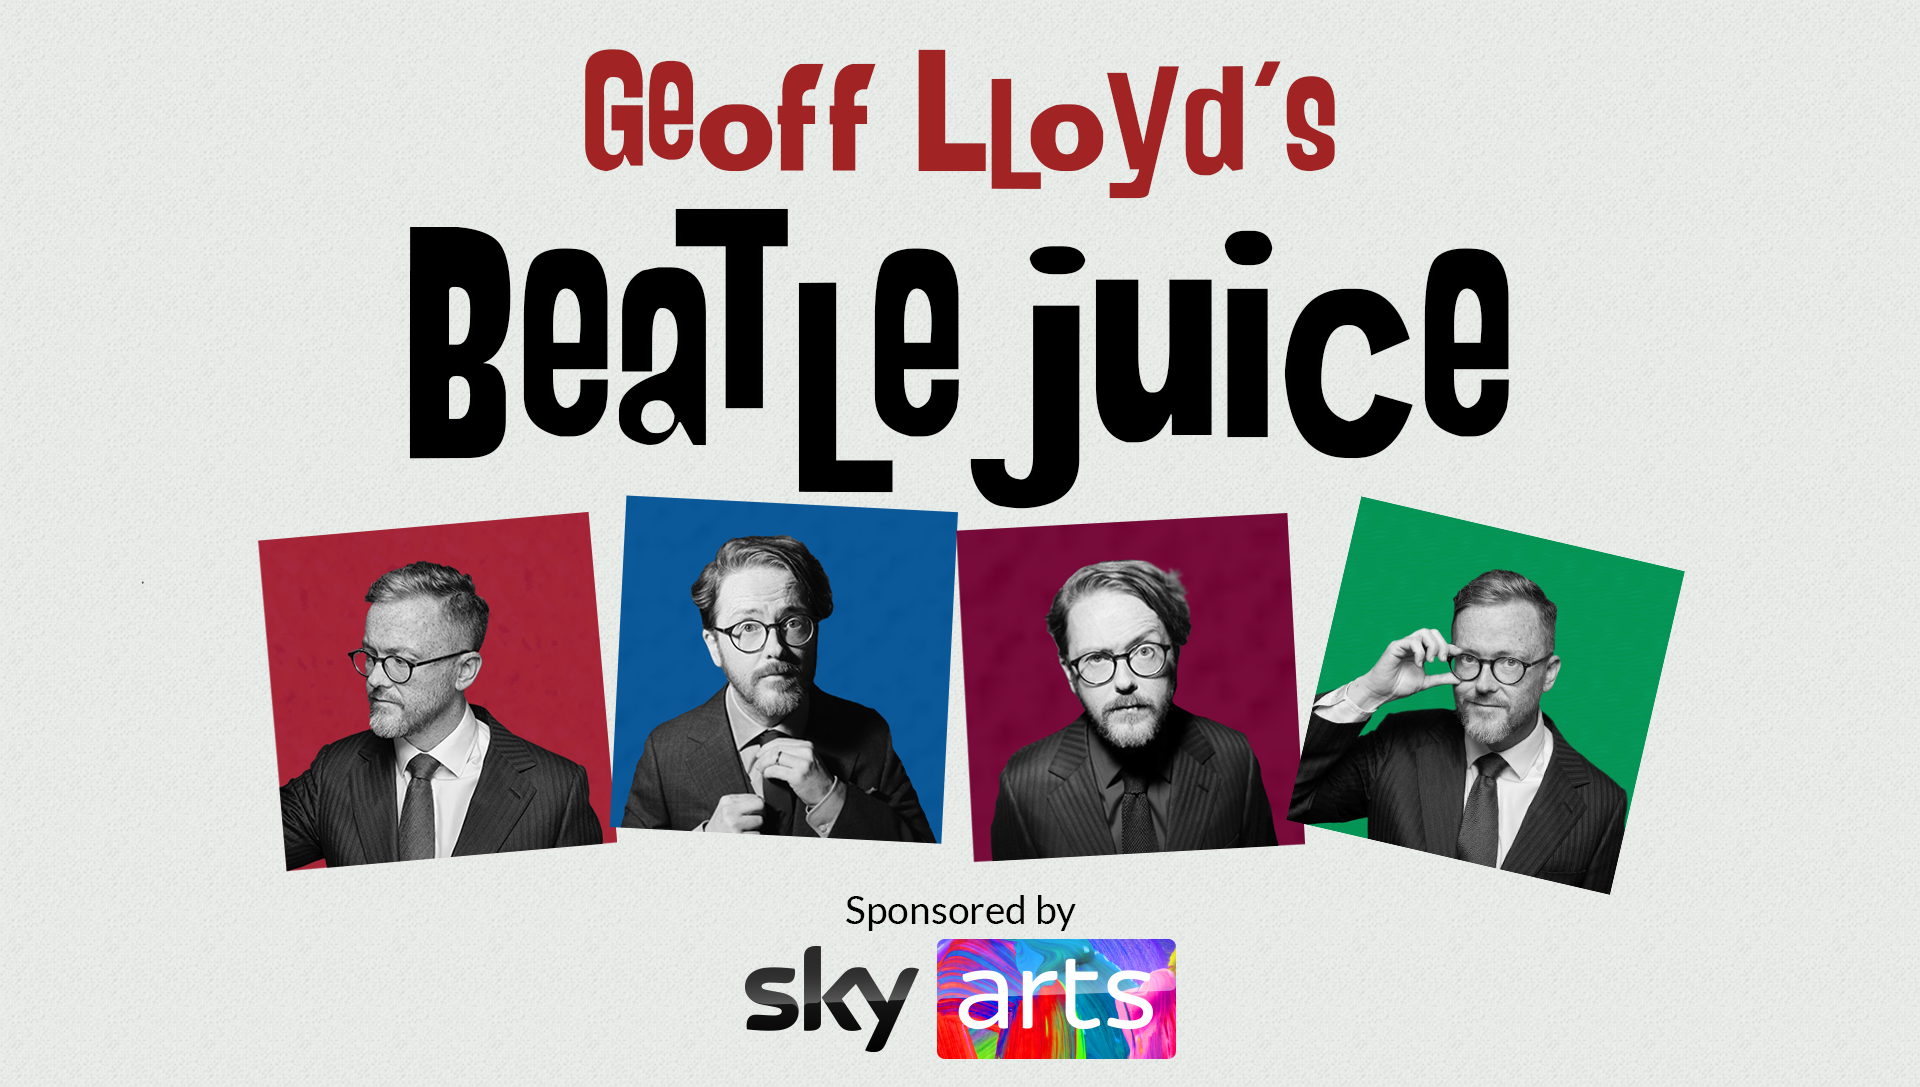 Geoff Lloyd's Beatlejuice